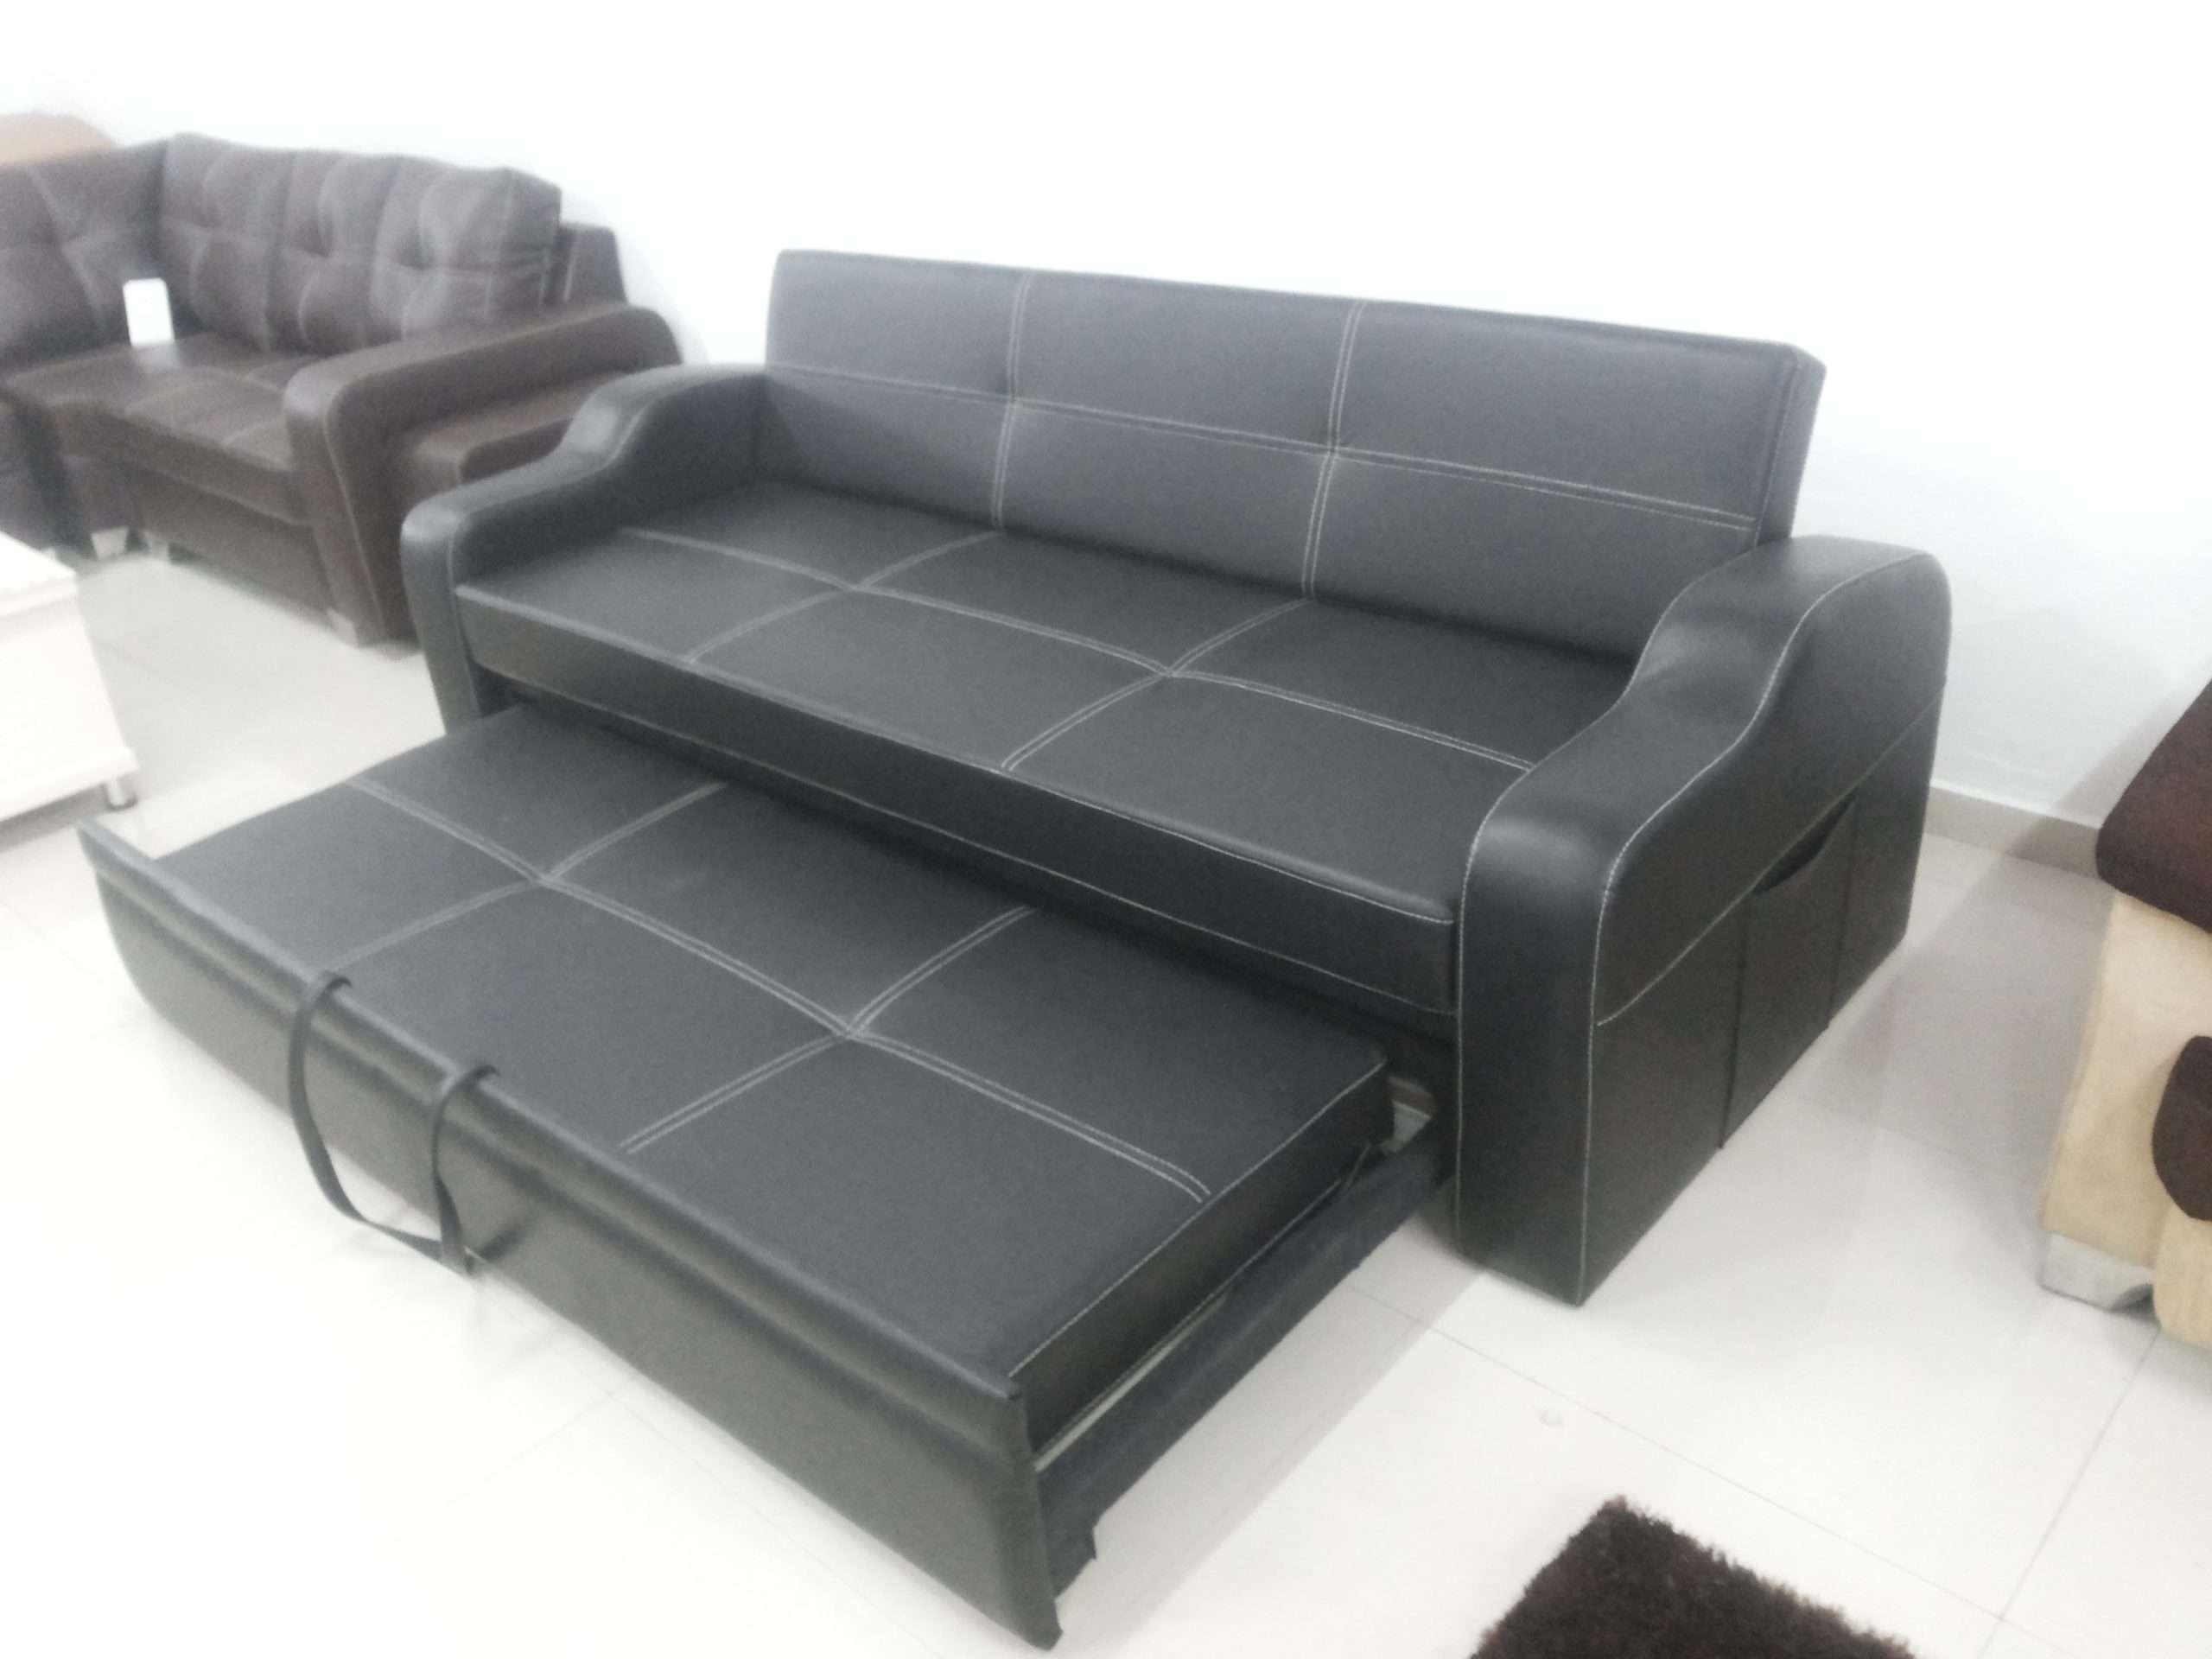 Sofa Cumbed Luxuriys Design By Astha Furniture Astha Furniture